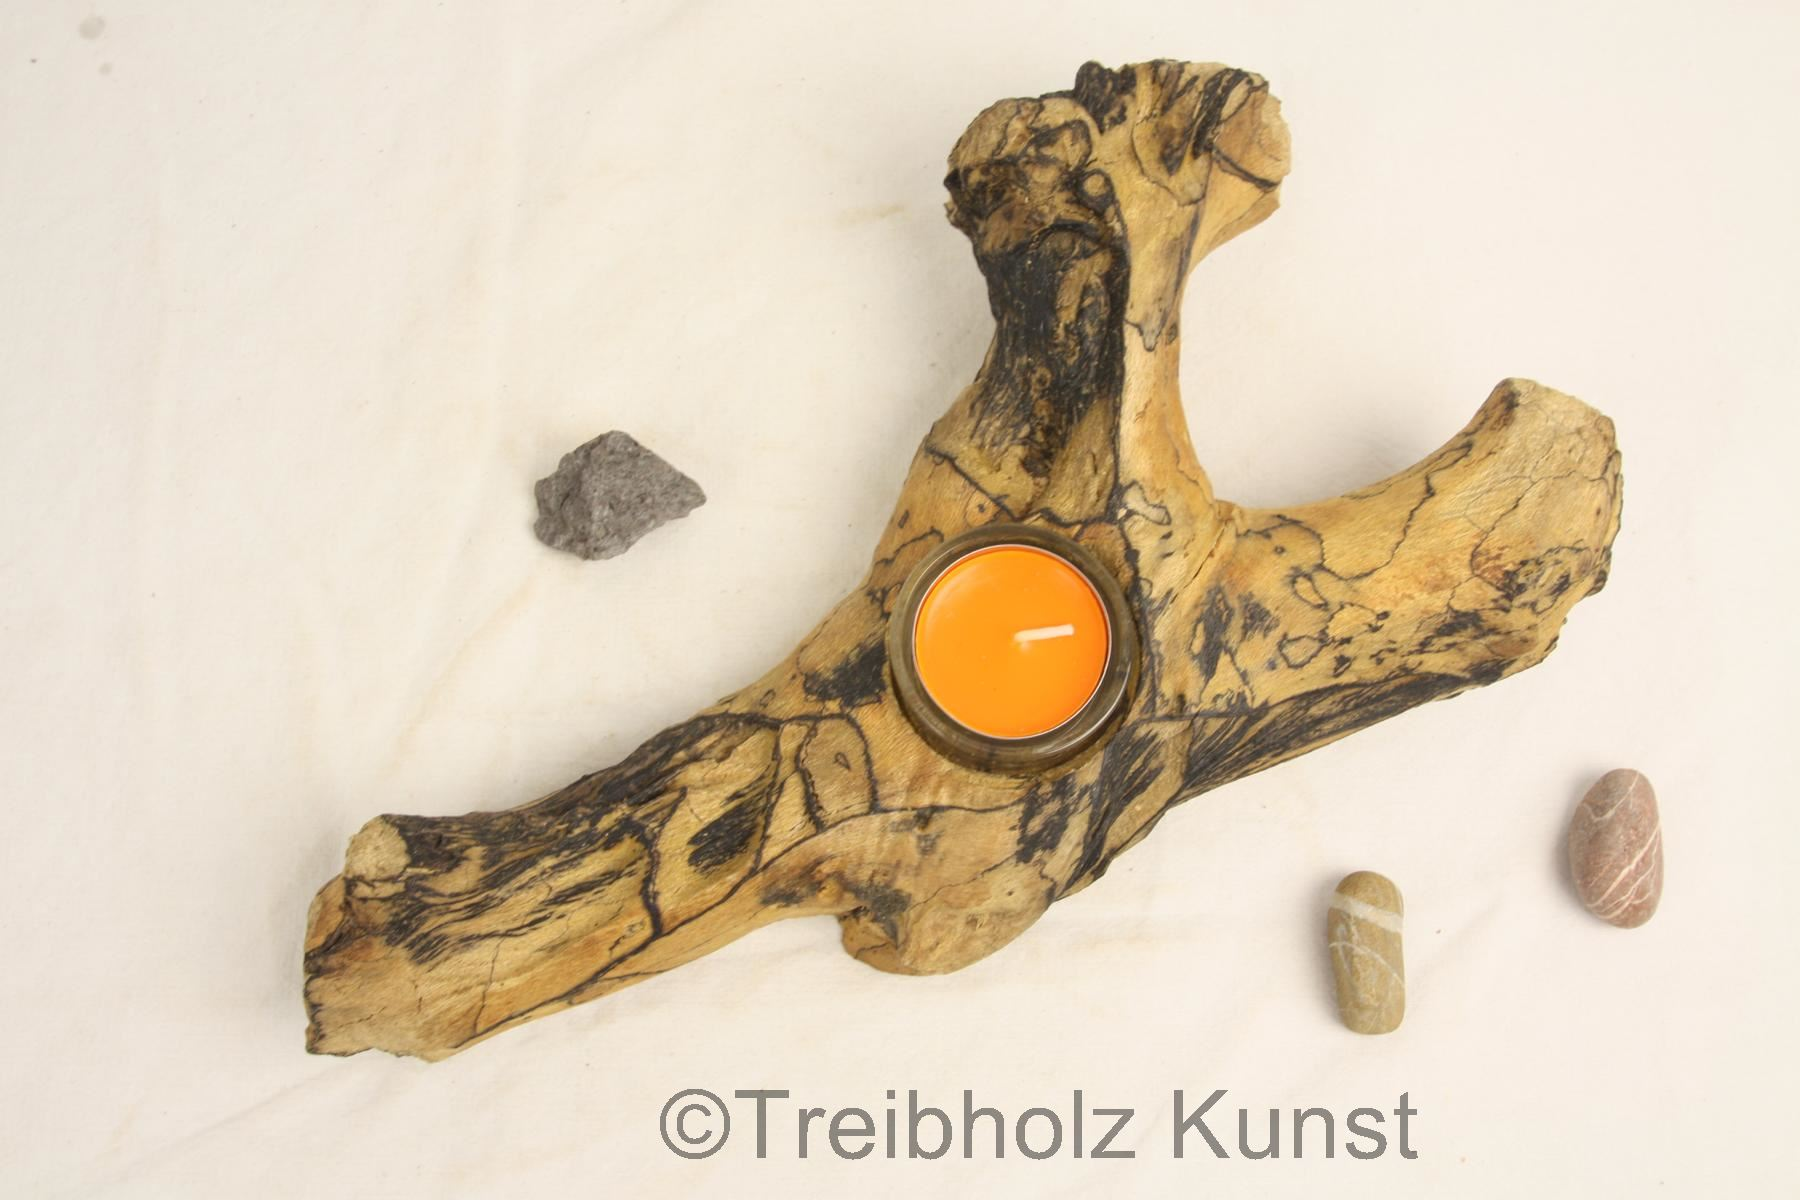 Treibholz Kunst treibholz kunst jens gürtler - www.treibholz-bodensee.de